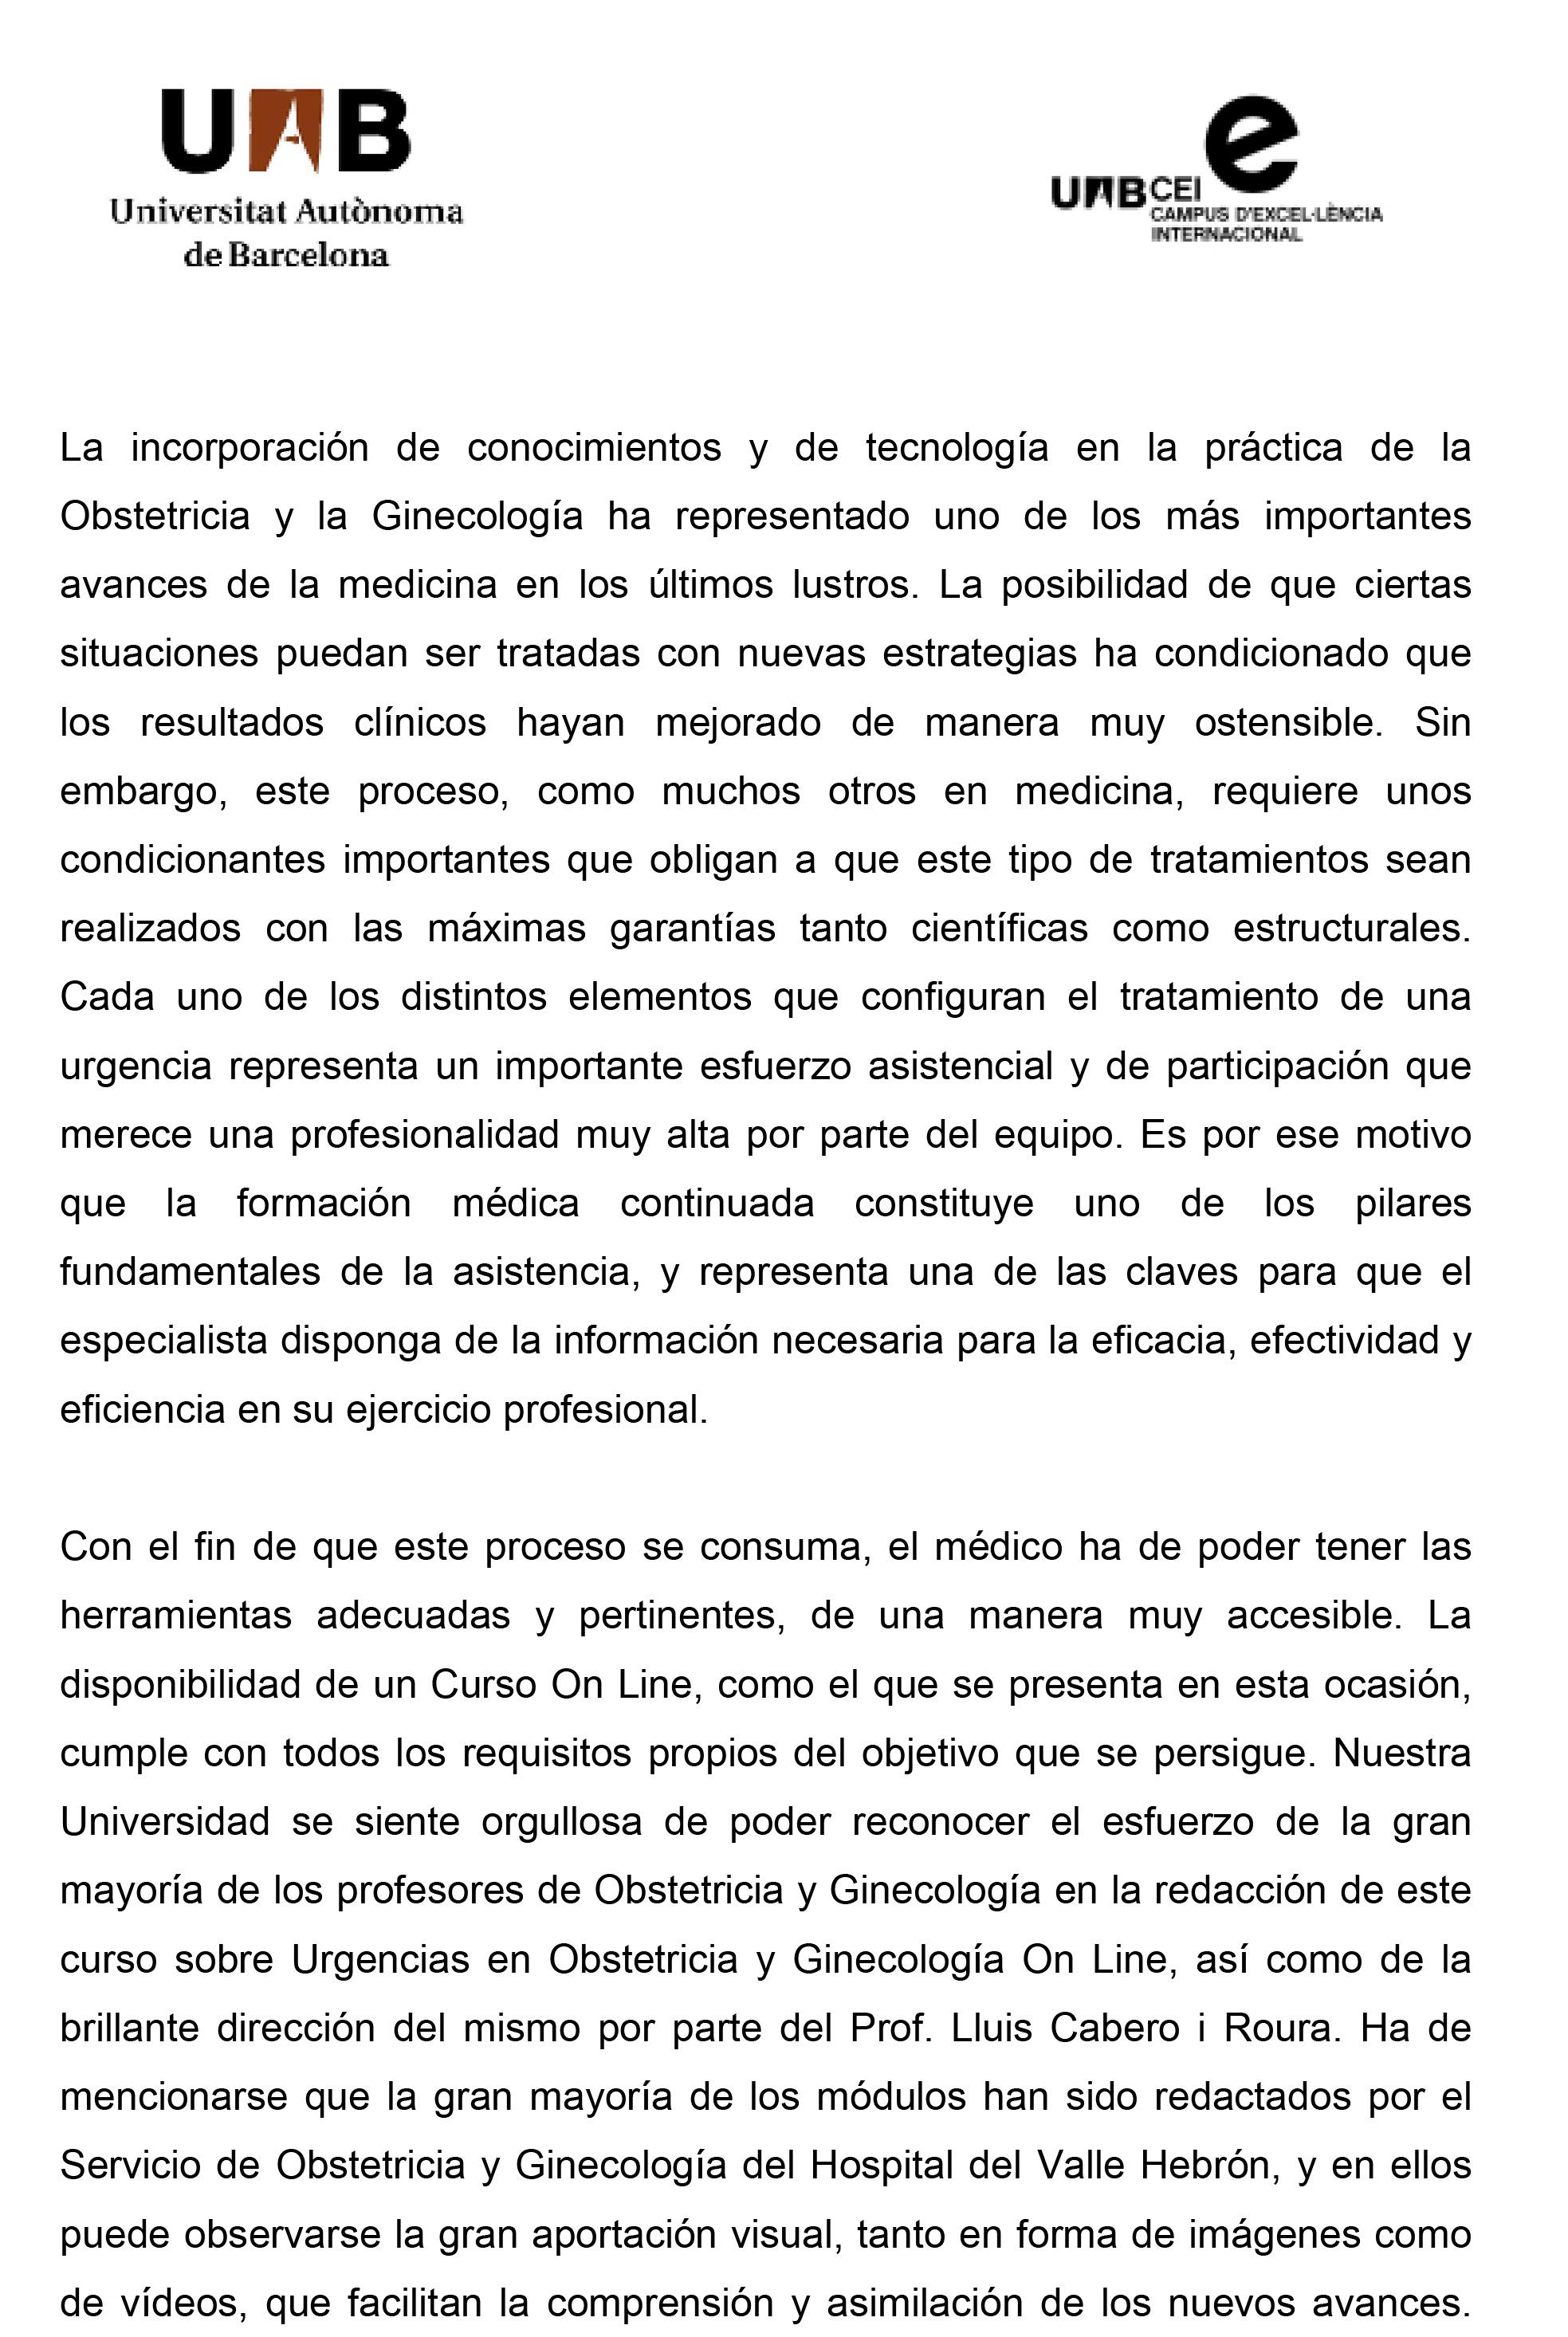 carta-UAB1